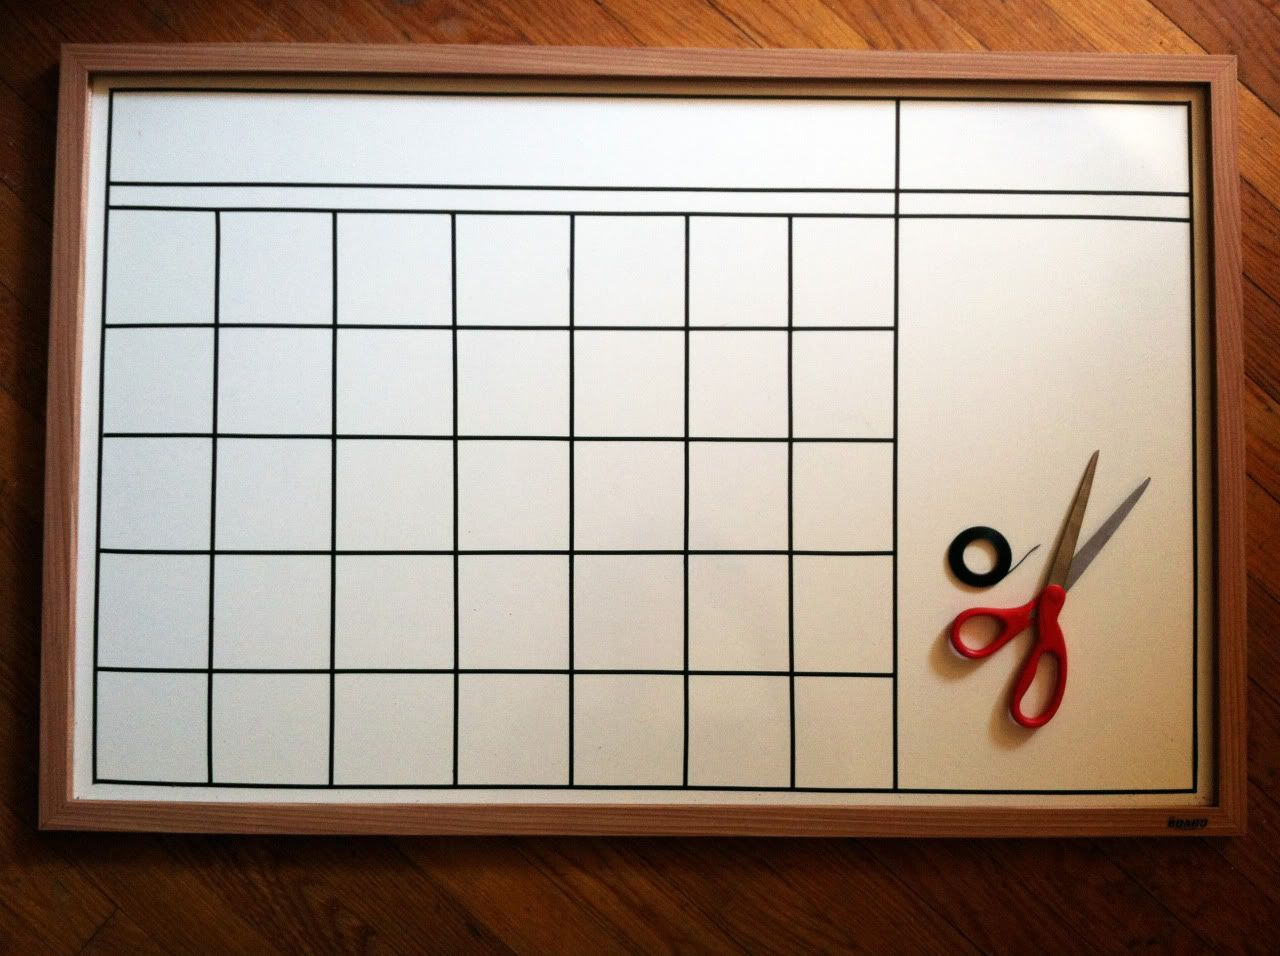 Diy Calendar Laurdiy : Little green notebook diy whiteboard calendar maybe to